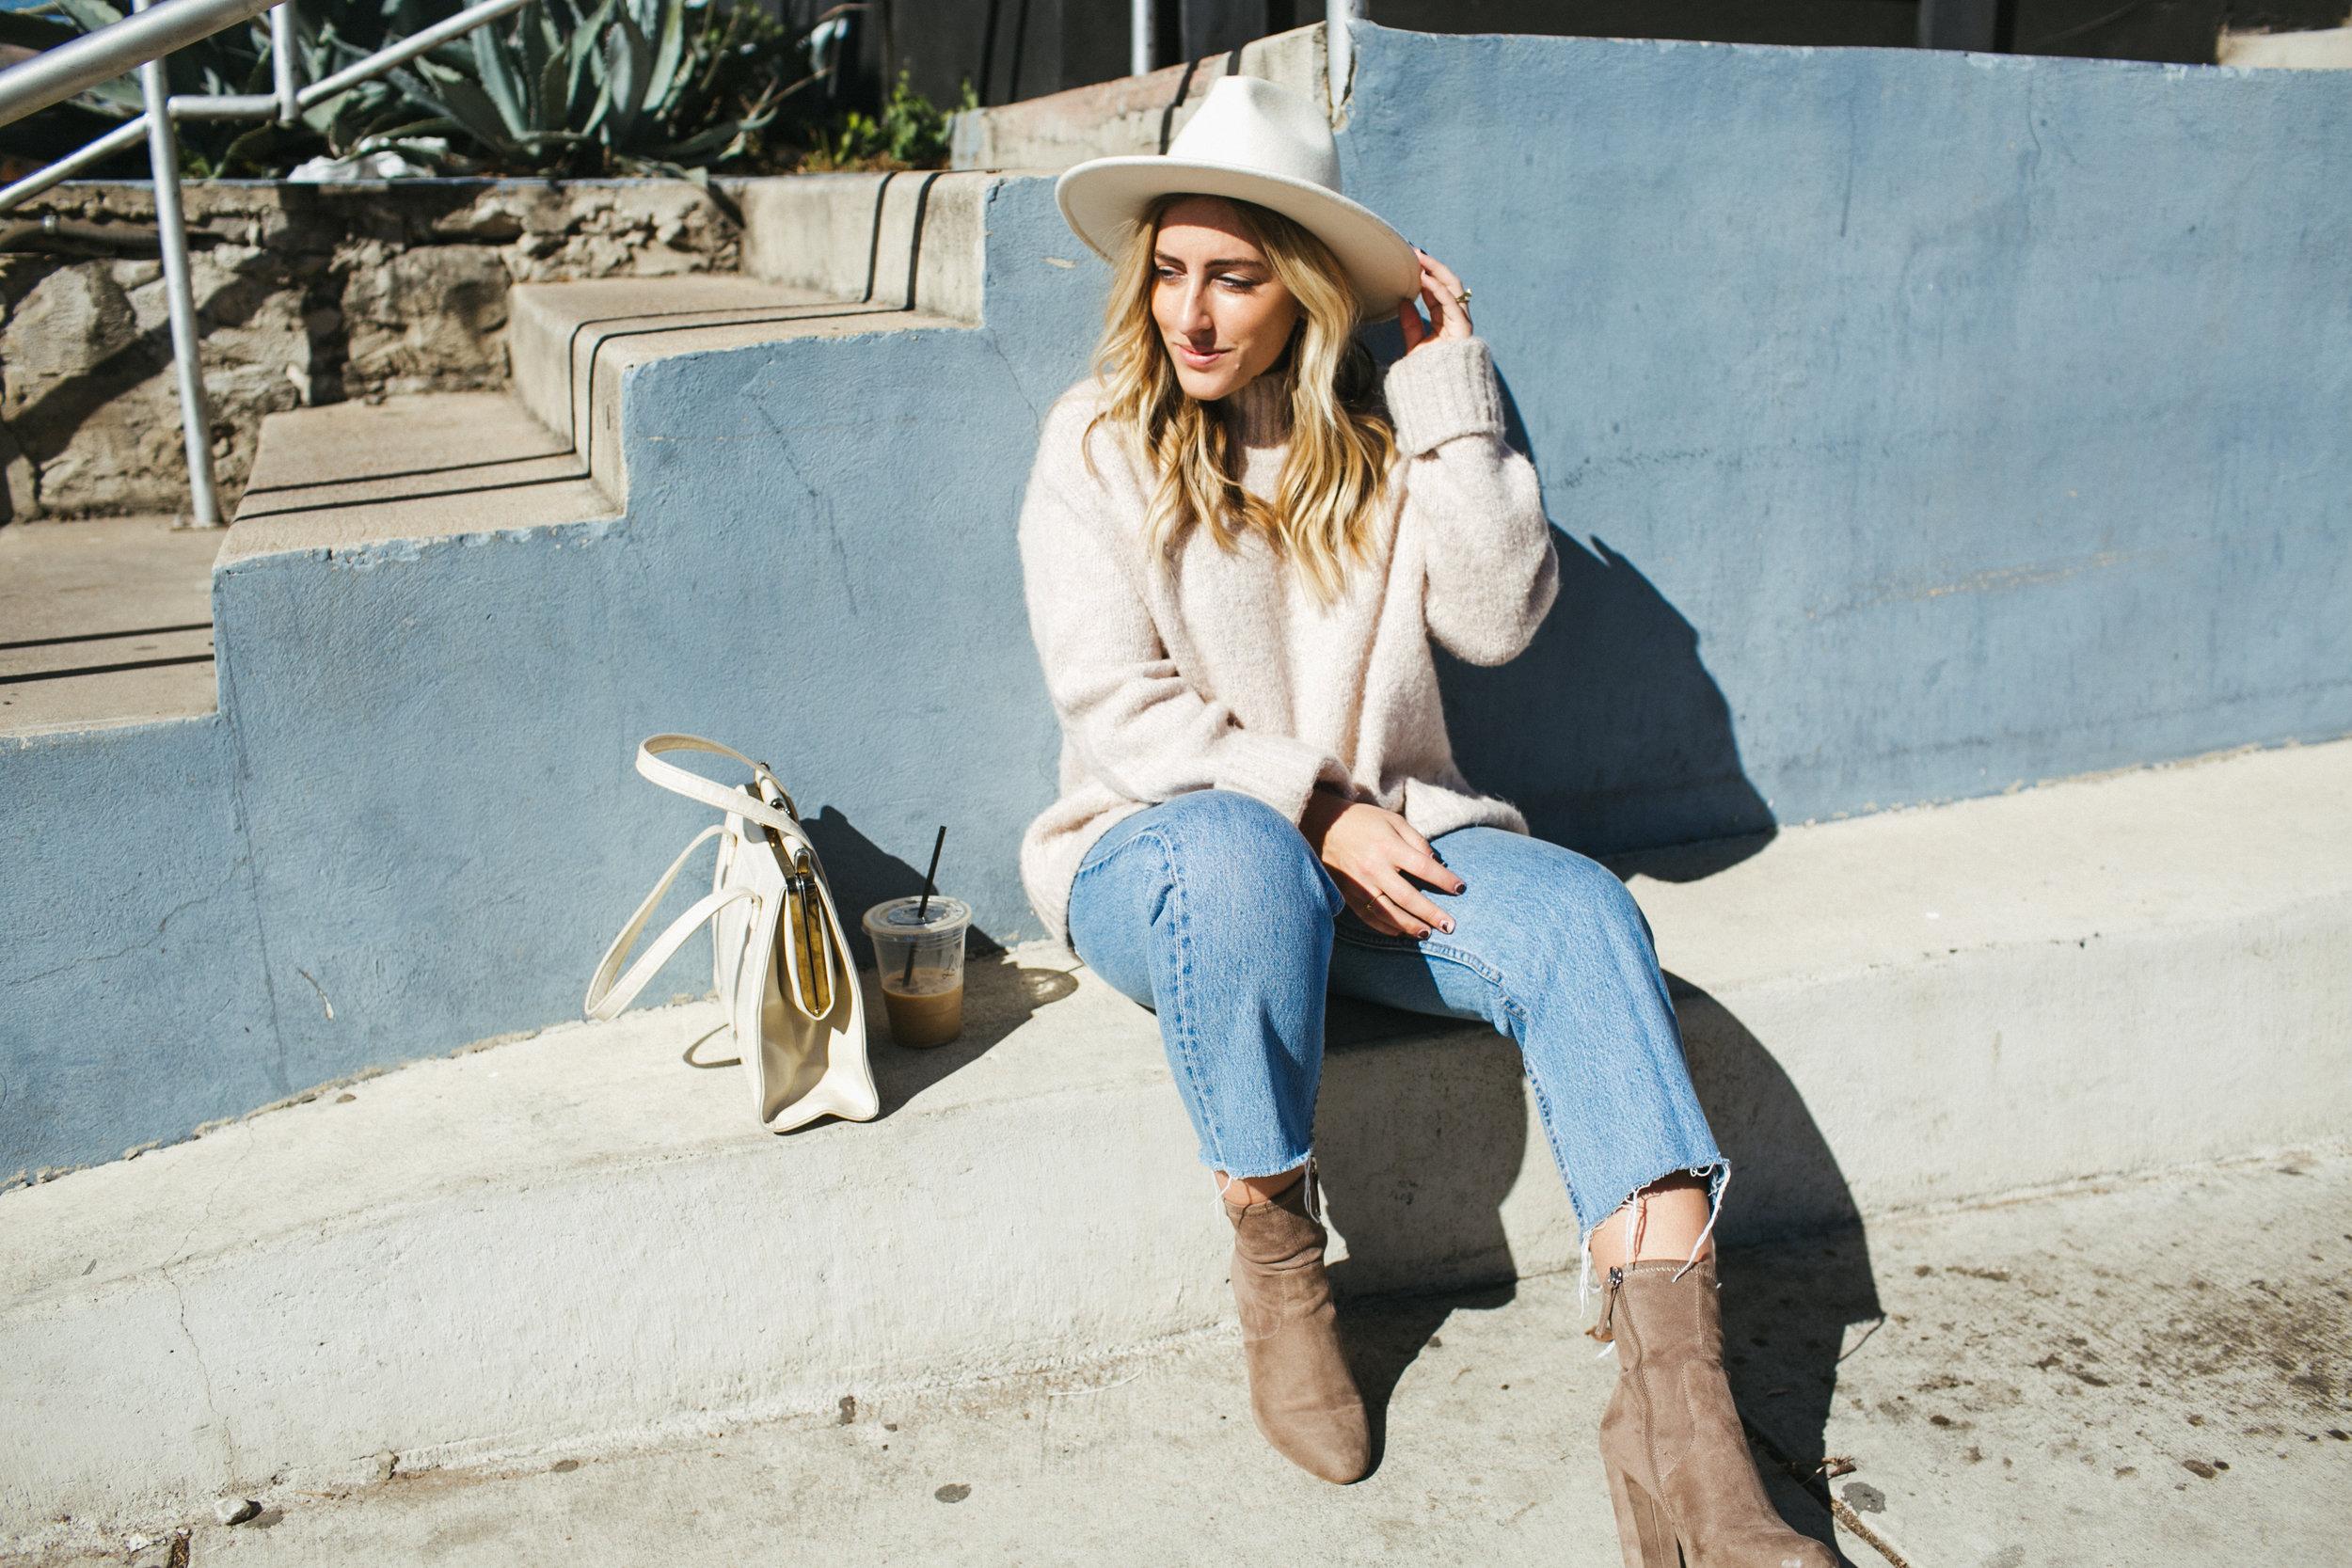 Paige-Newton-Lifestyle-Fashion-Blogger-Influencer-Photography-061.jpg